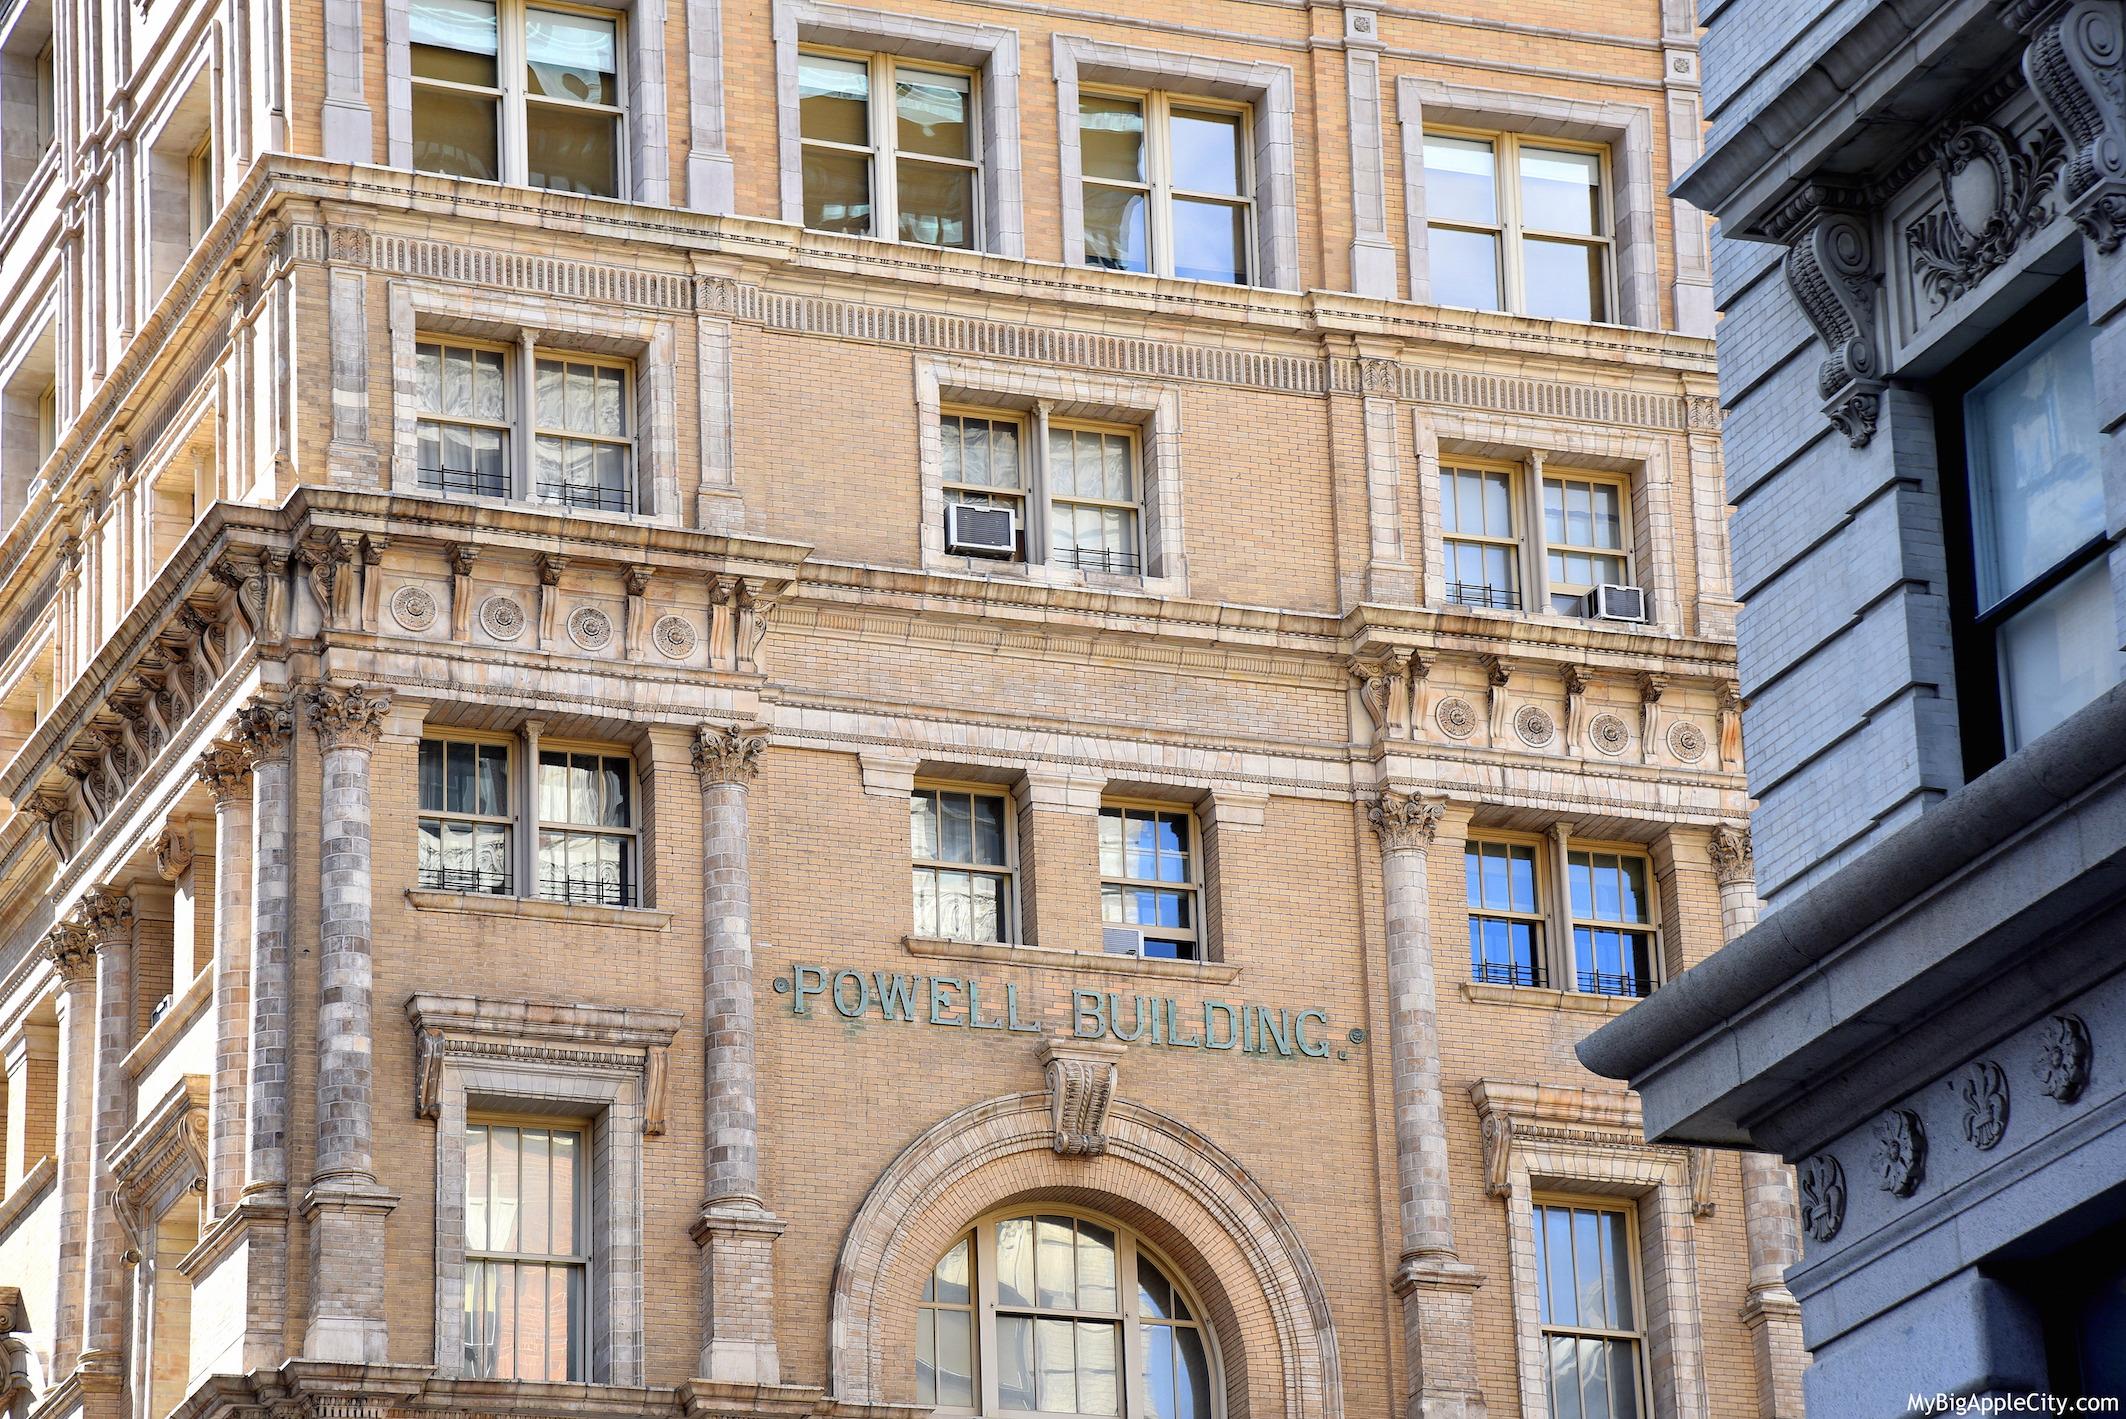 Powell-building-landmark-visit-tribeca-nyc-tour